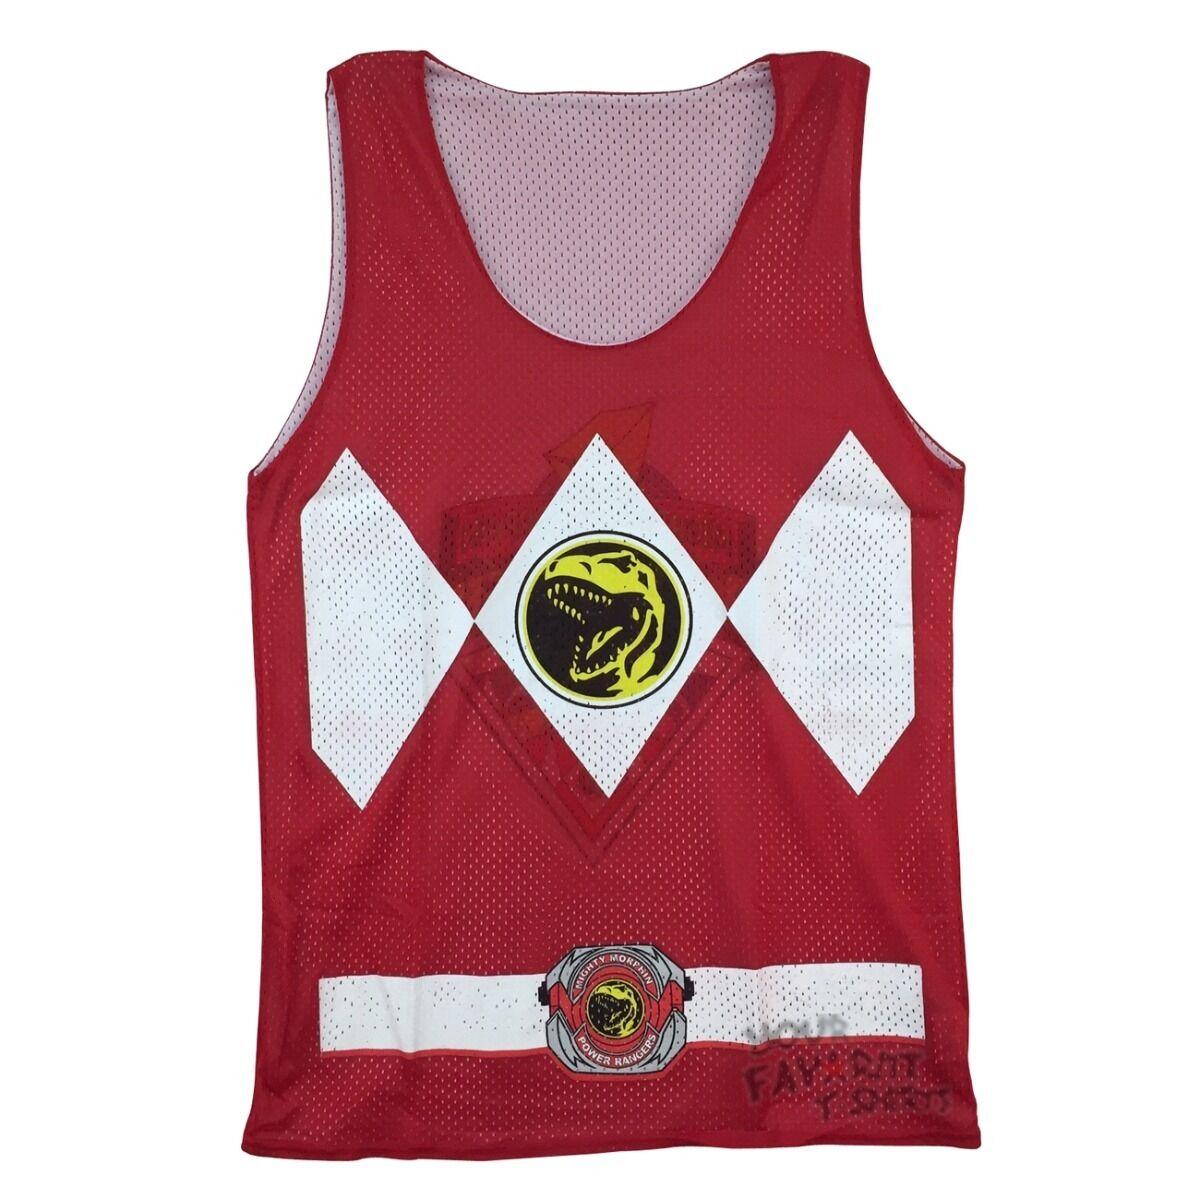 Power Rangers Red Ranger Symbol Costume Reversible Mesh Tank Top